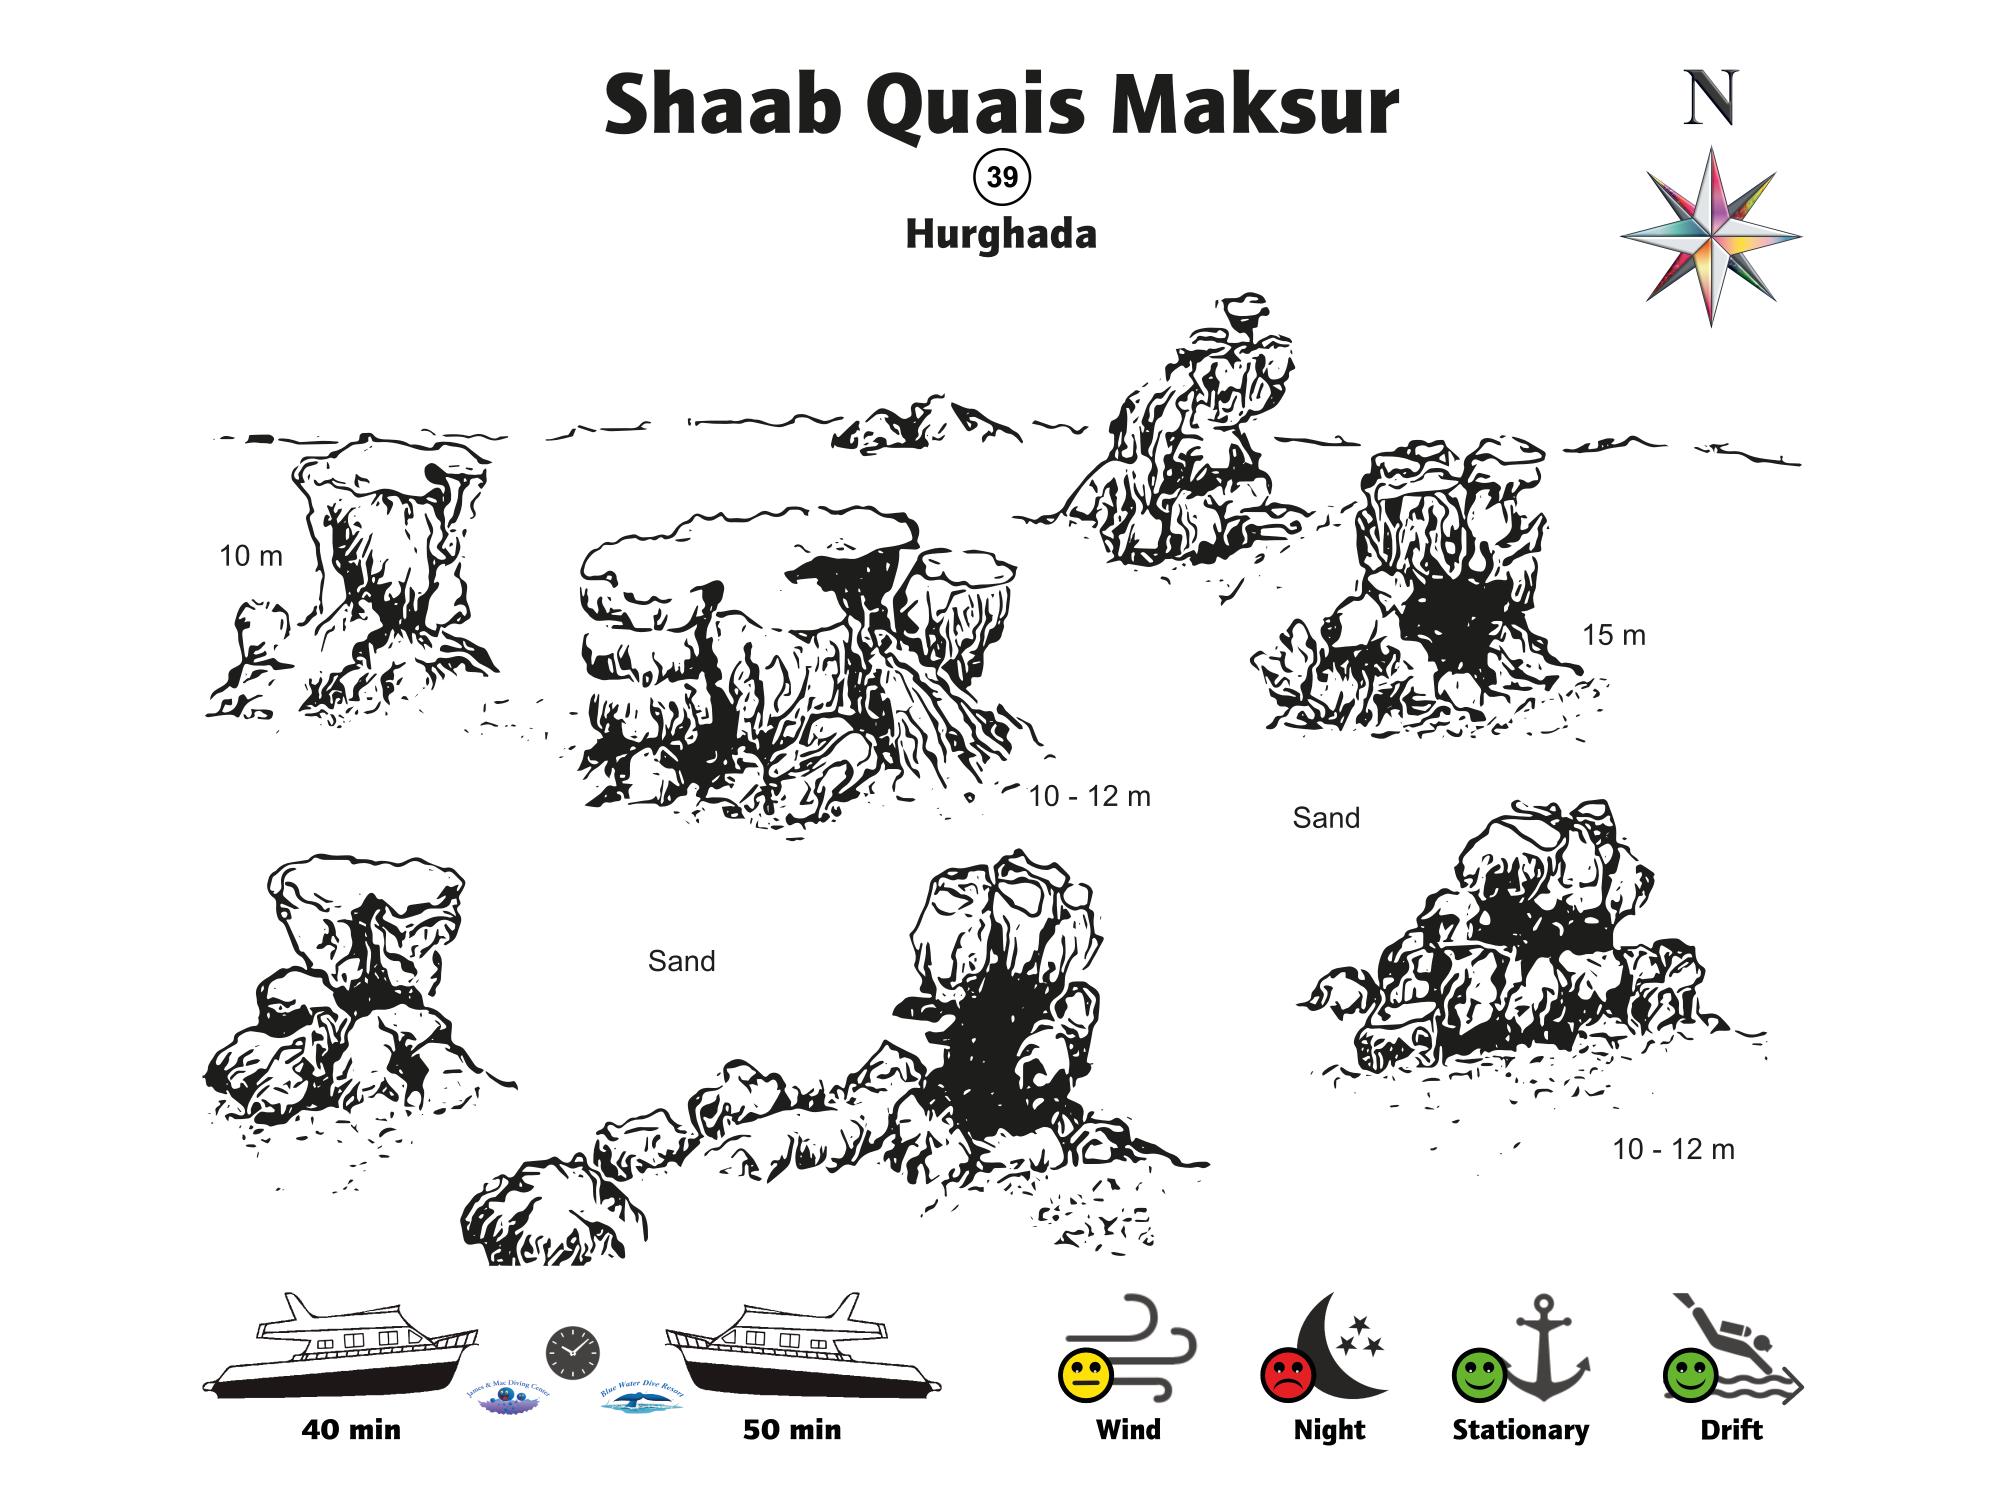 Shaab Quais Maksur